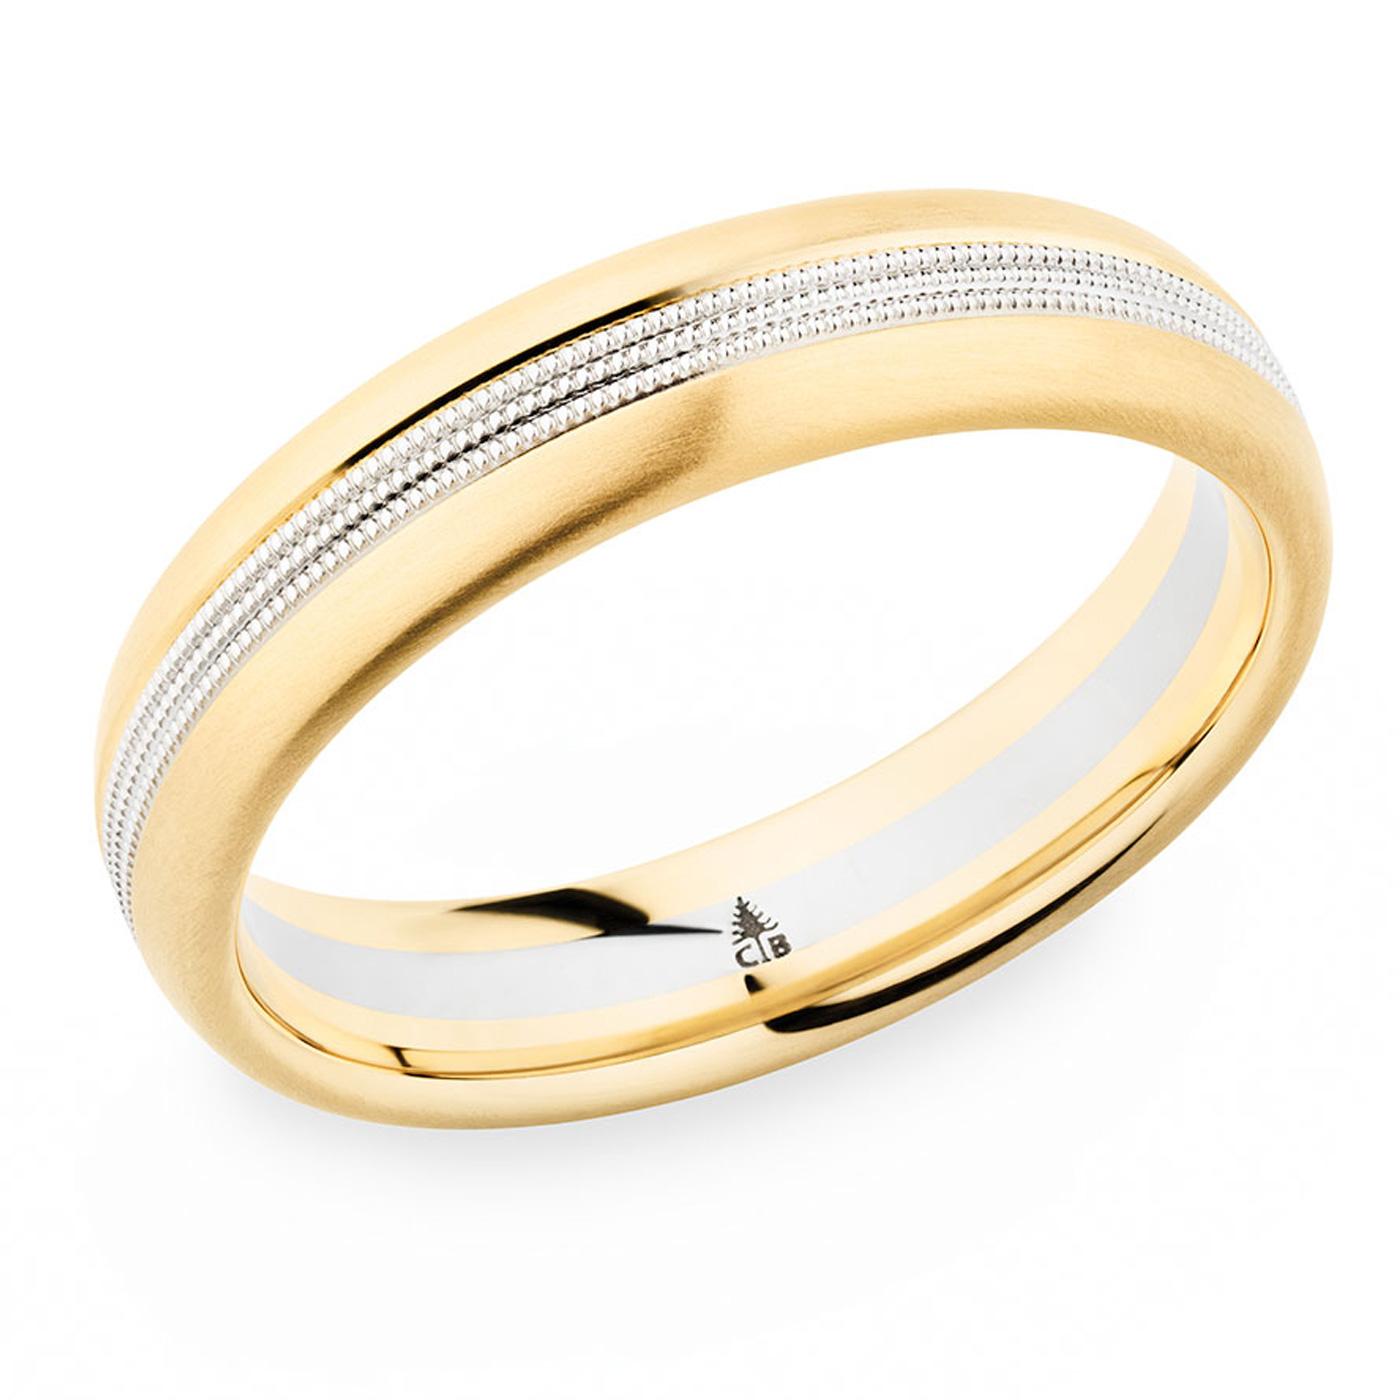 274420 Bauer Platinum 18 Karat Wedding Ring